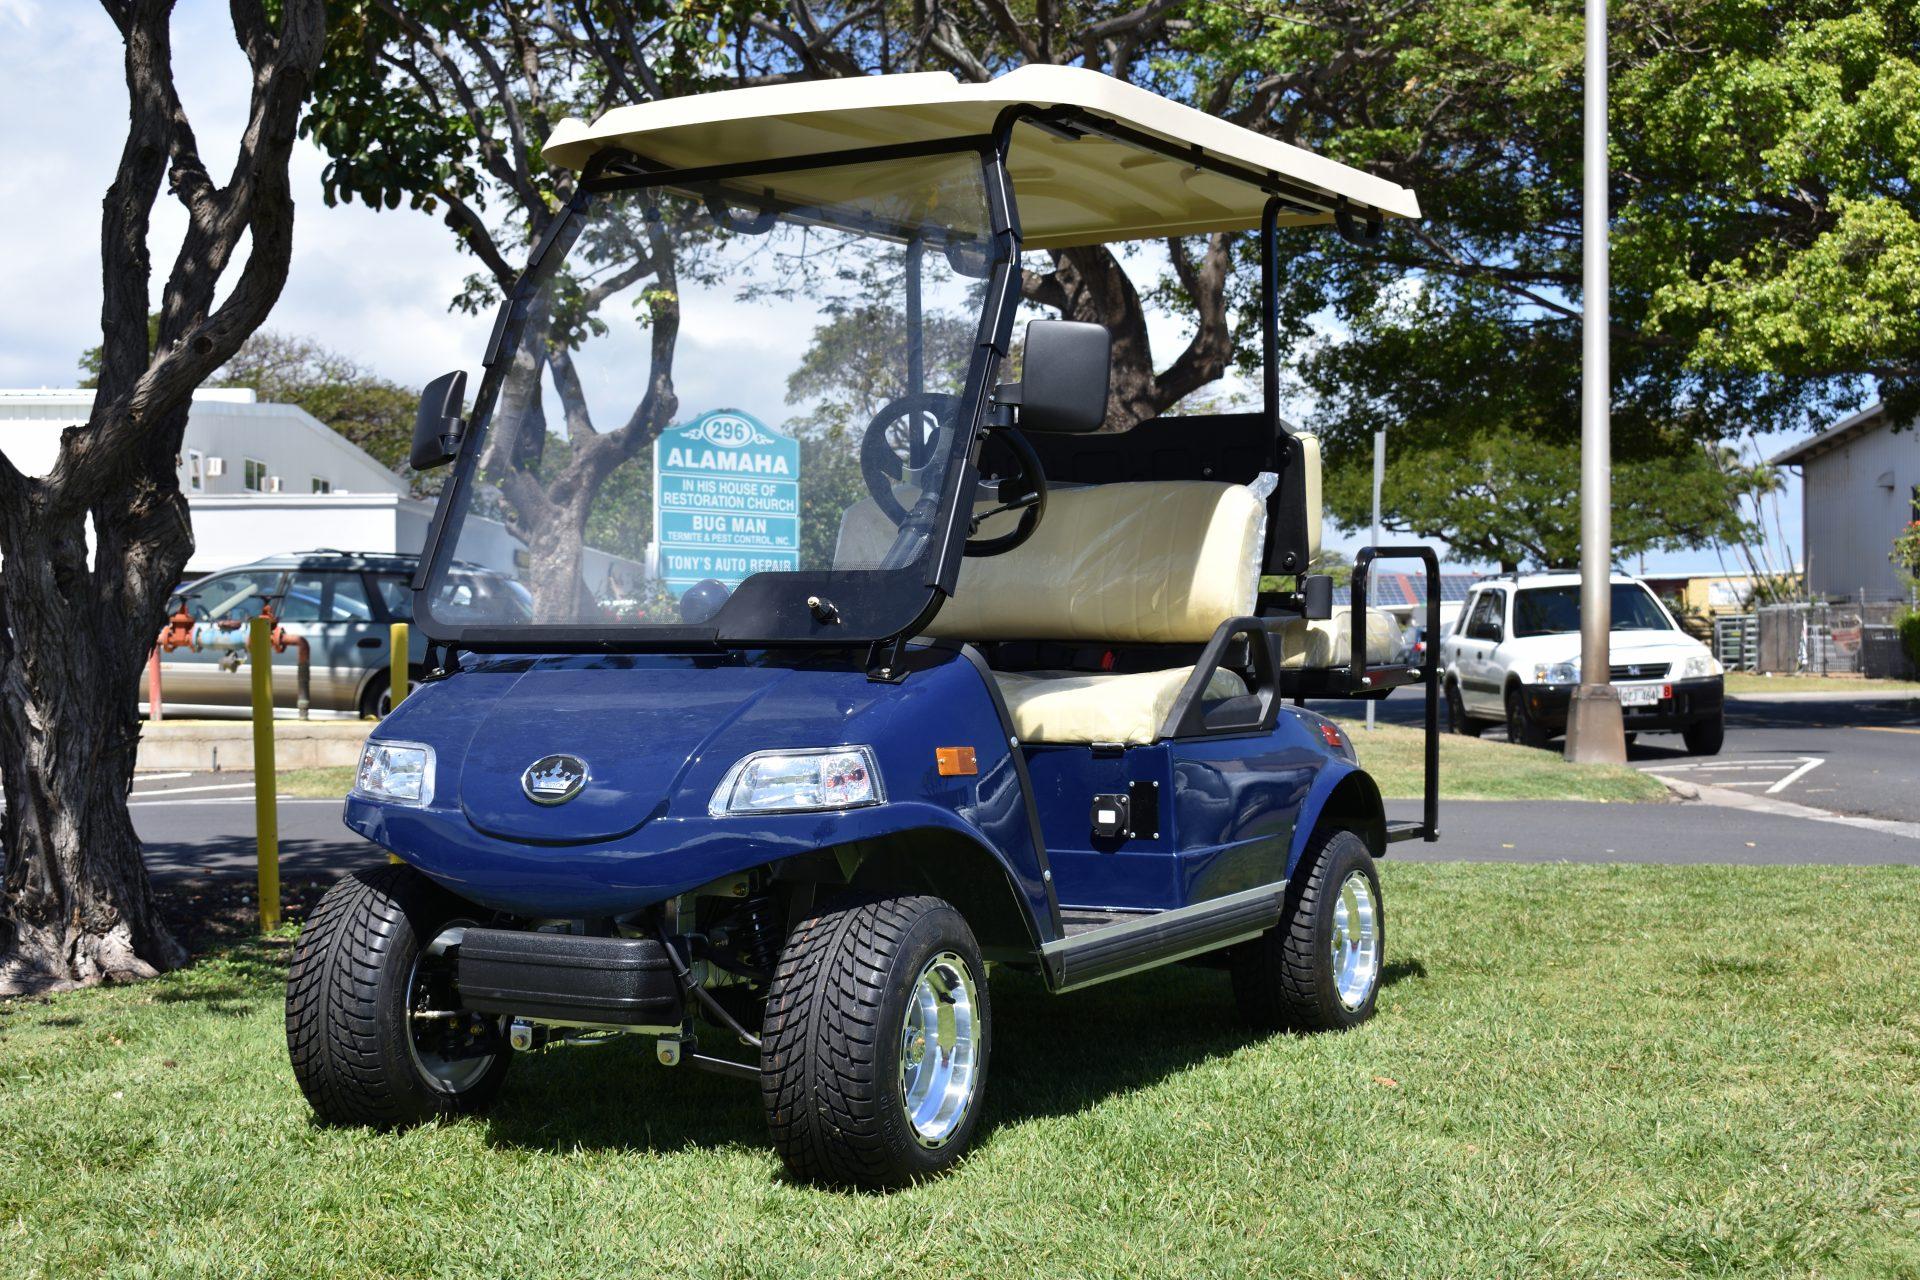 Golf Cart Maui Golf Cart Engine Burning Oil on golf cart engine conversion, golf cart oil filters, yamaha rhino engine oil, golf cart engine upgrade, john deere tractor engine oil, ez go golf cart oil, golf cart engine diagram, golf cart engine swap, golf cart engine rebuild,